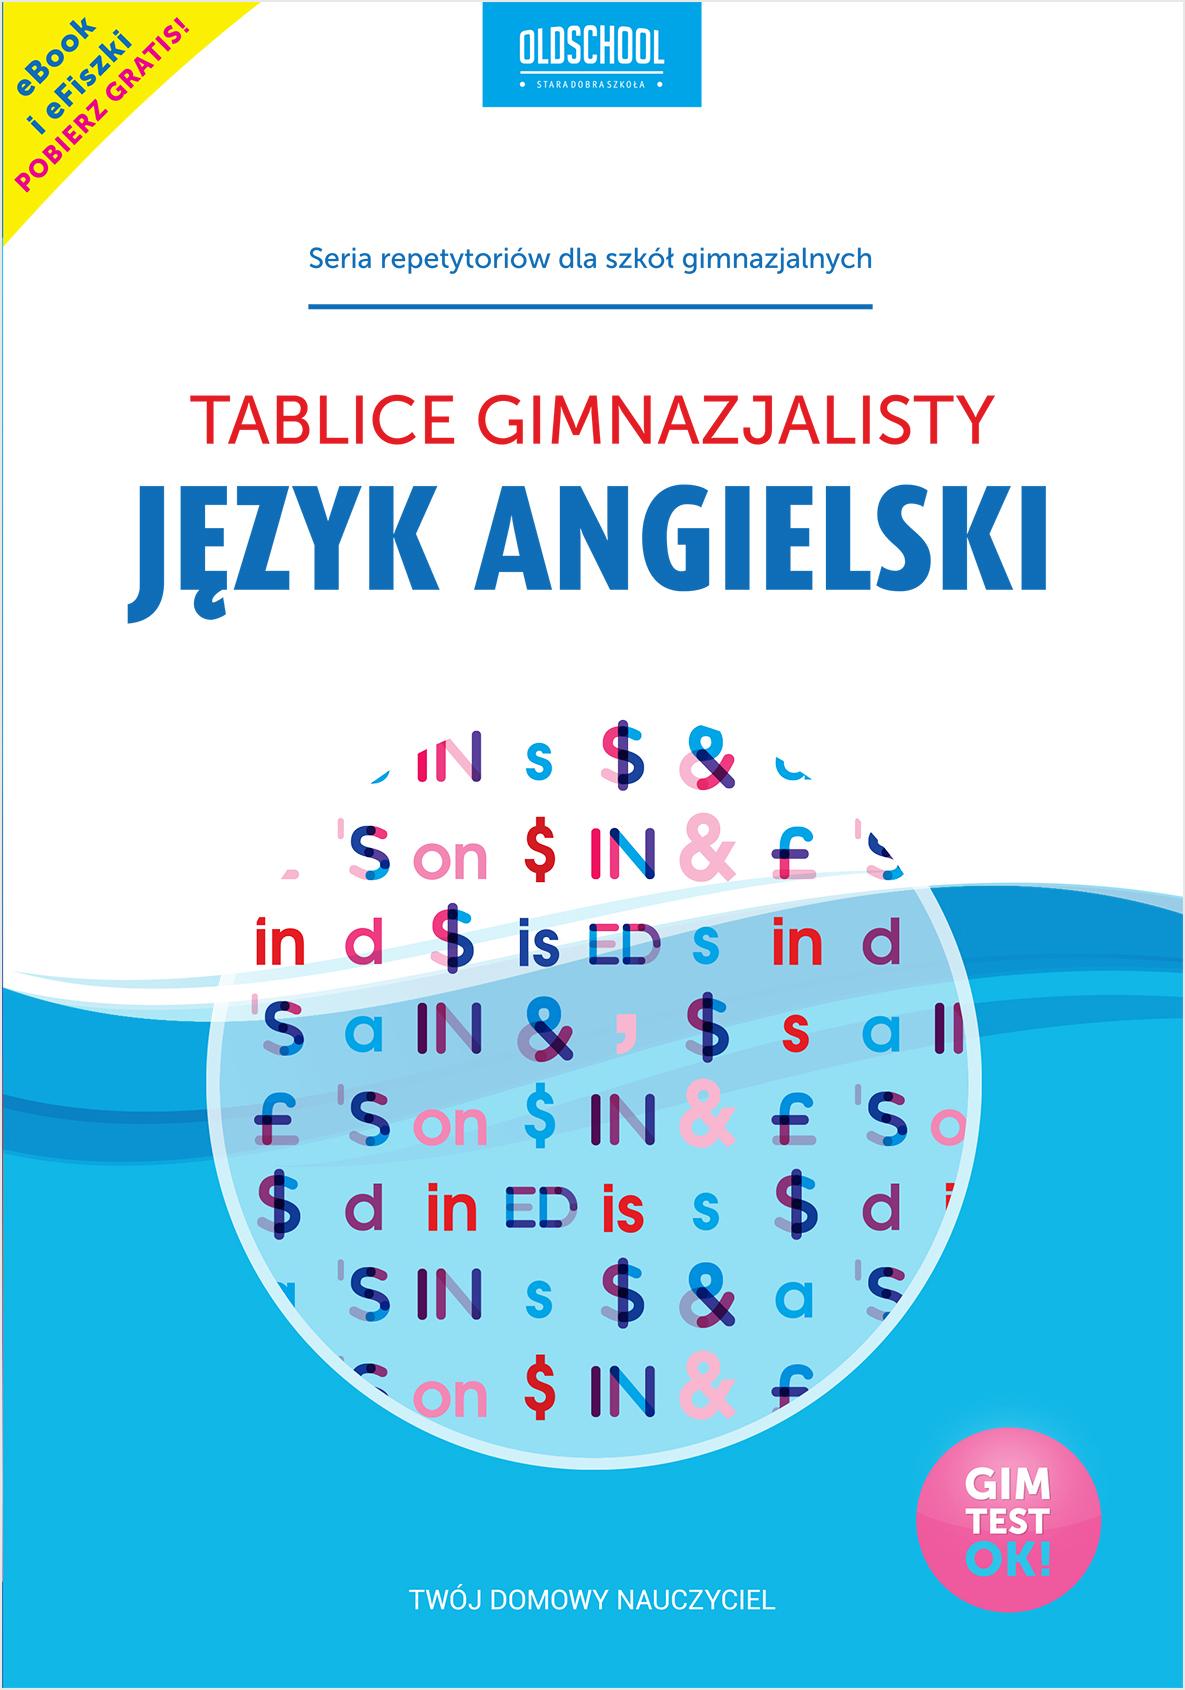 polski_okladka